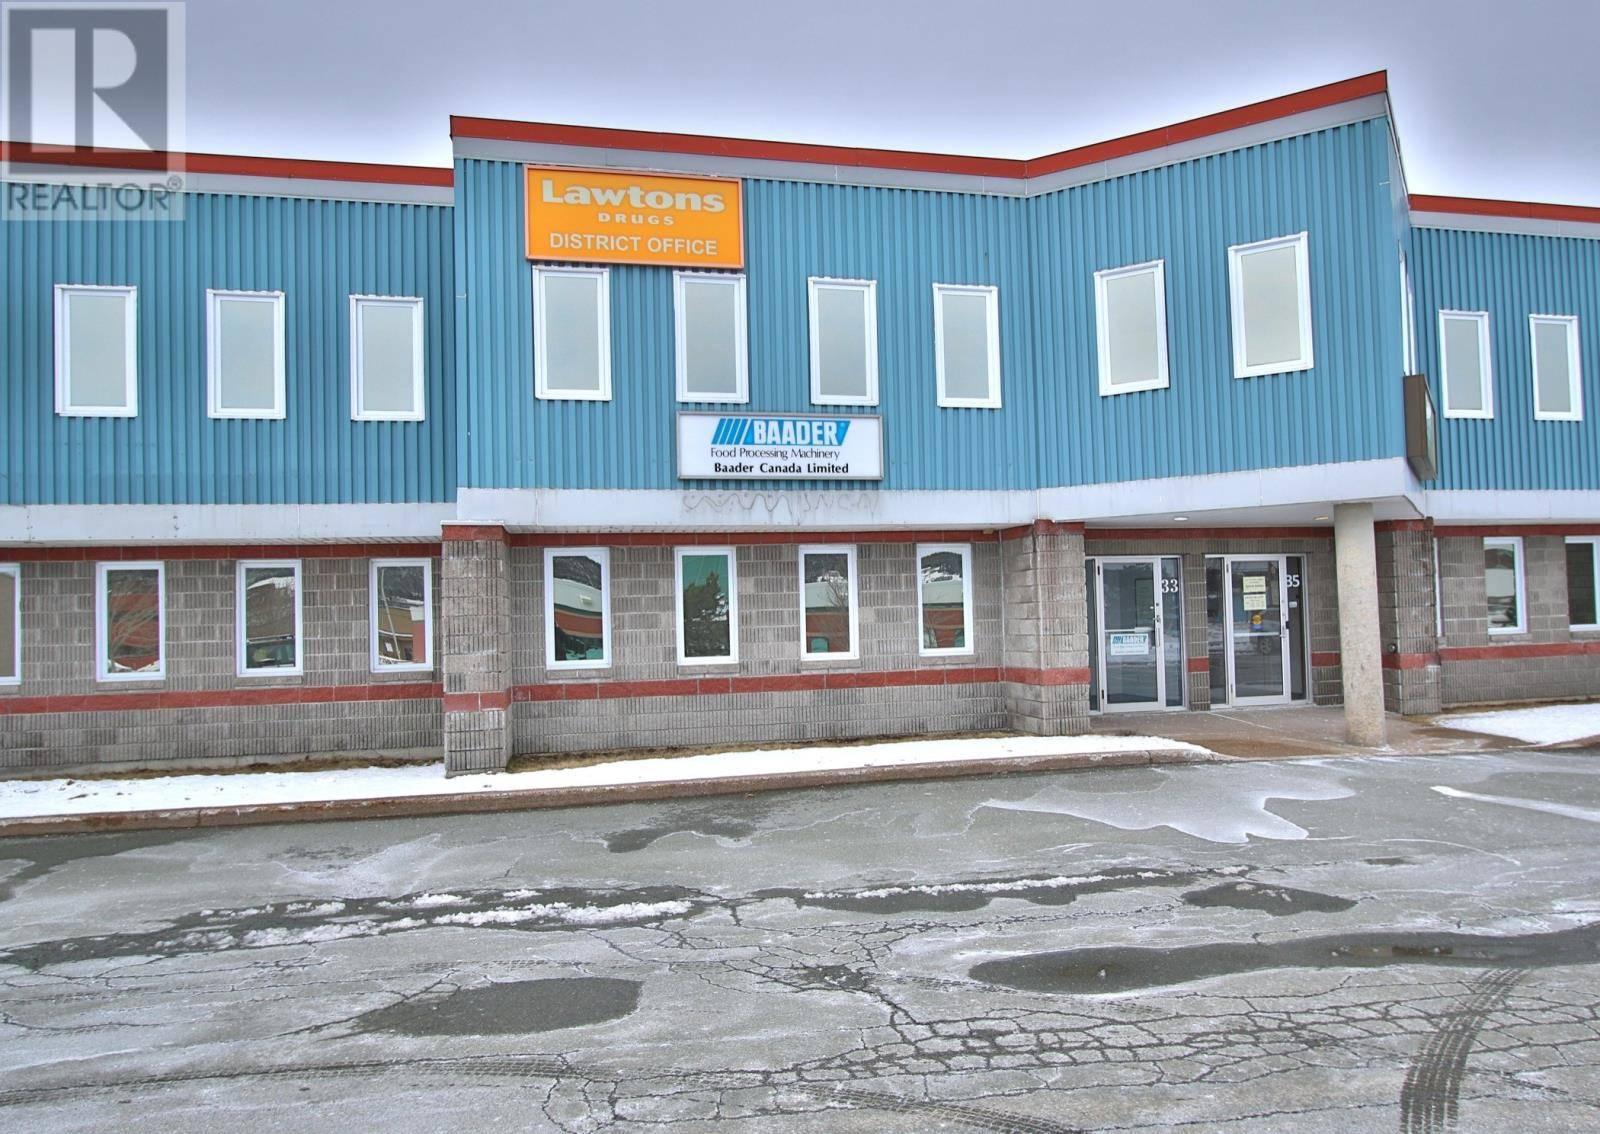 Property for rent at 25 Hallett Cres Unit 3 St. John's Newfoundland - MLS: 1197126